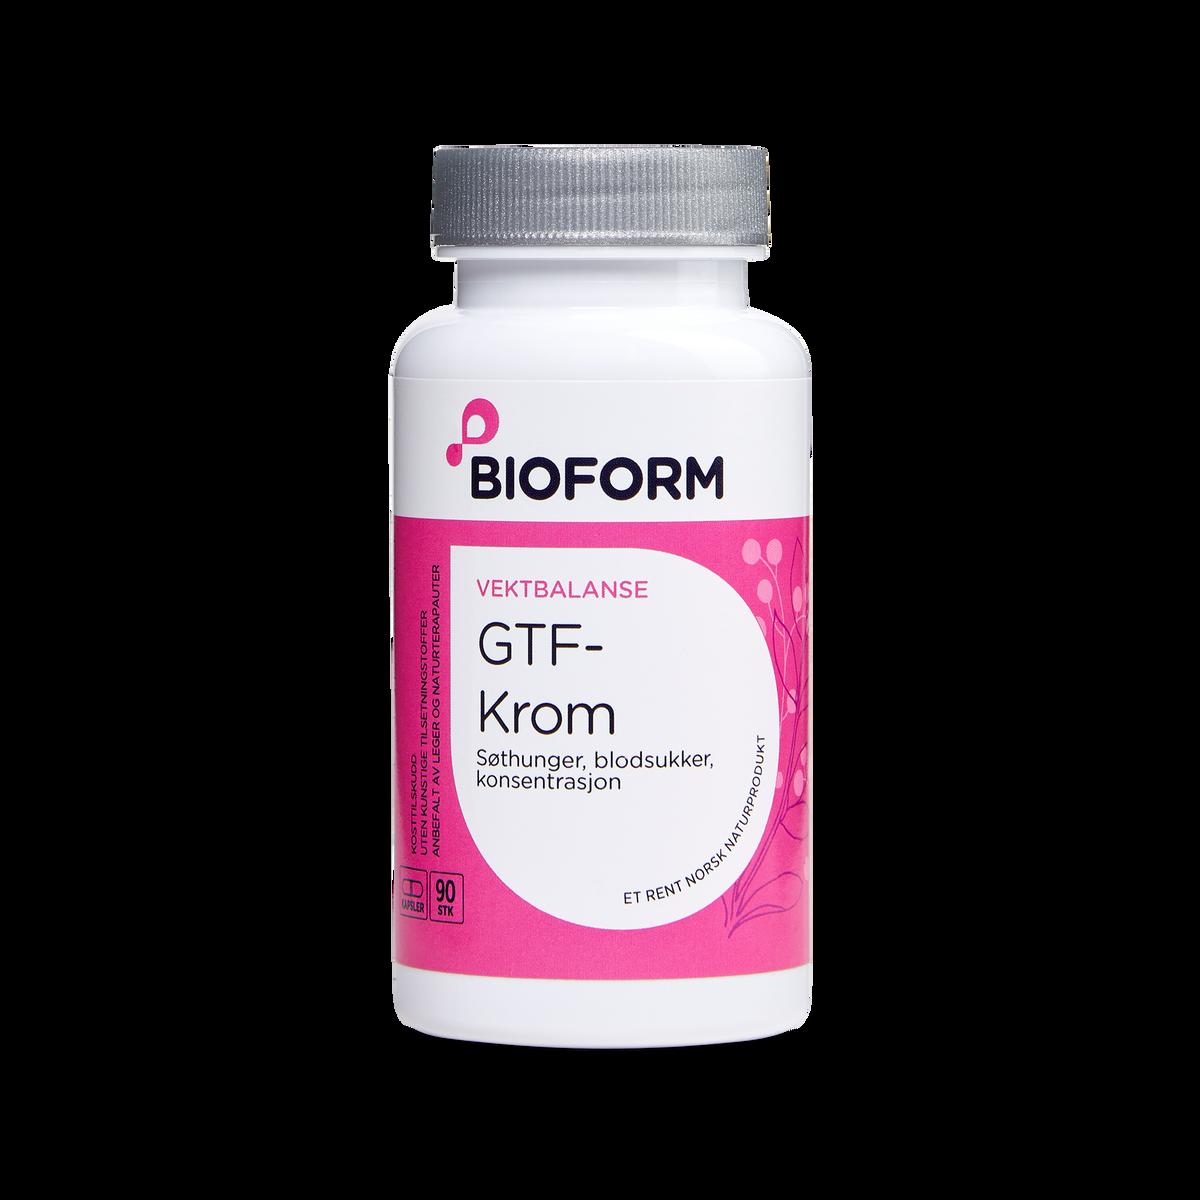 GTF Krom